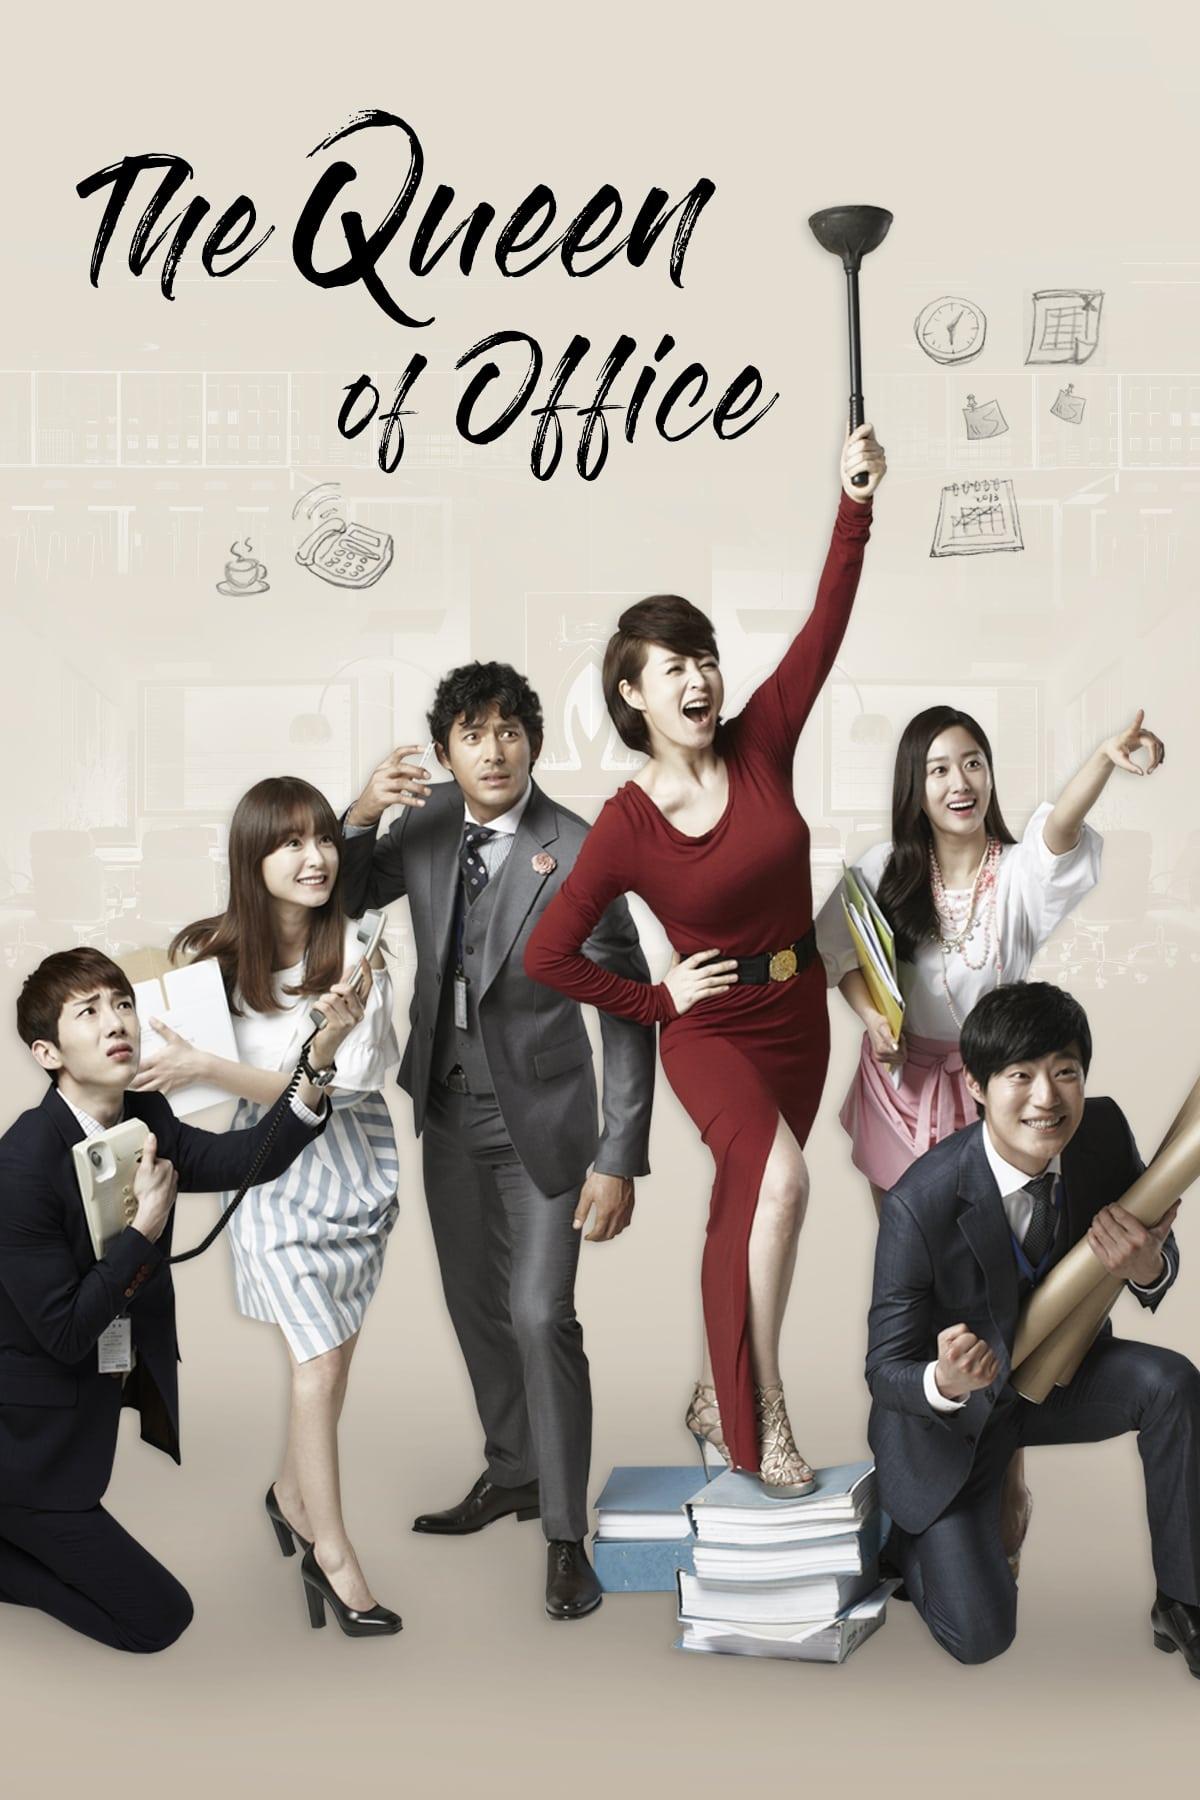 The Queen of Office (2013)